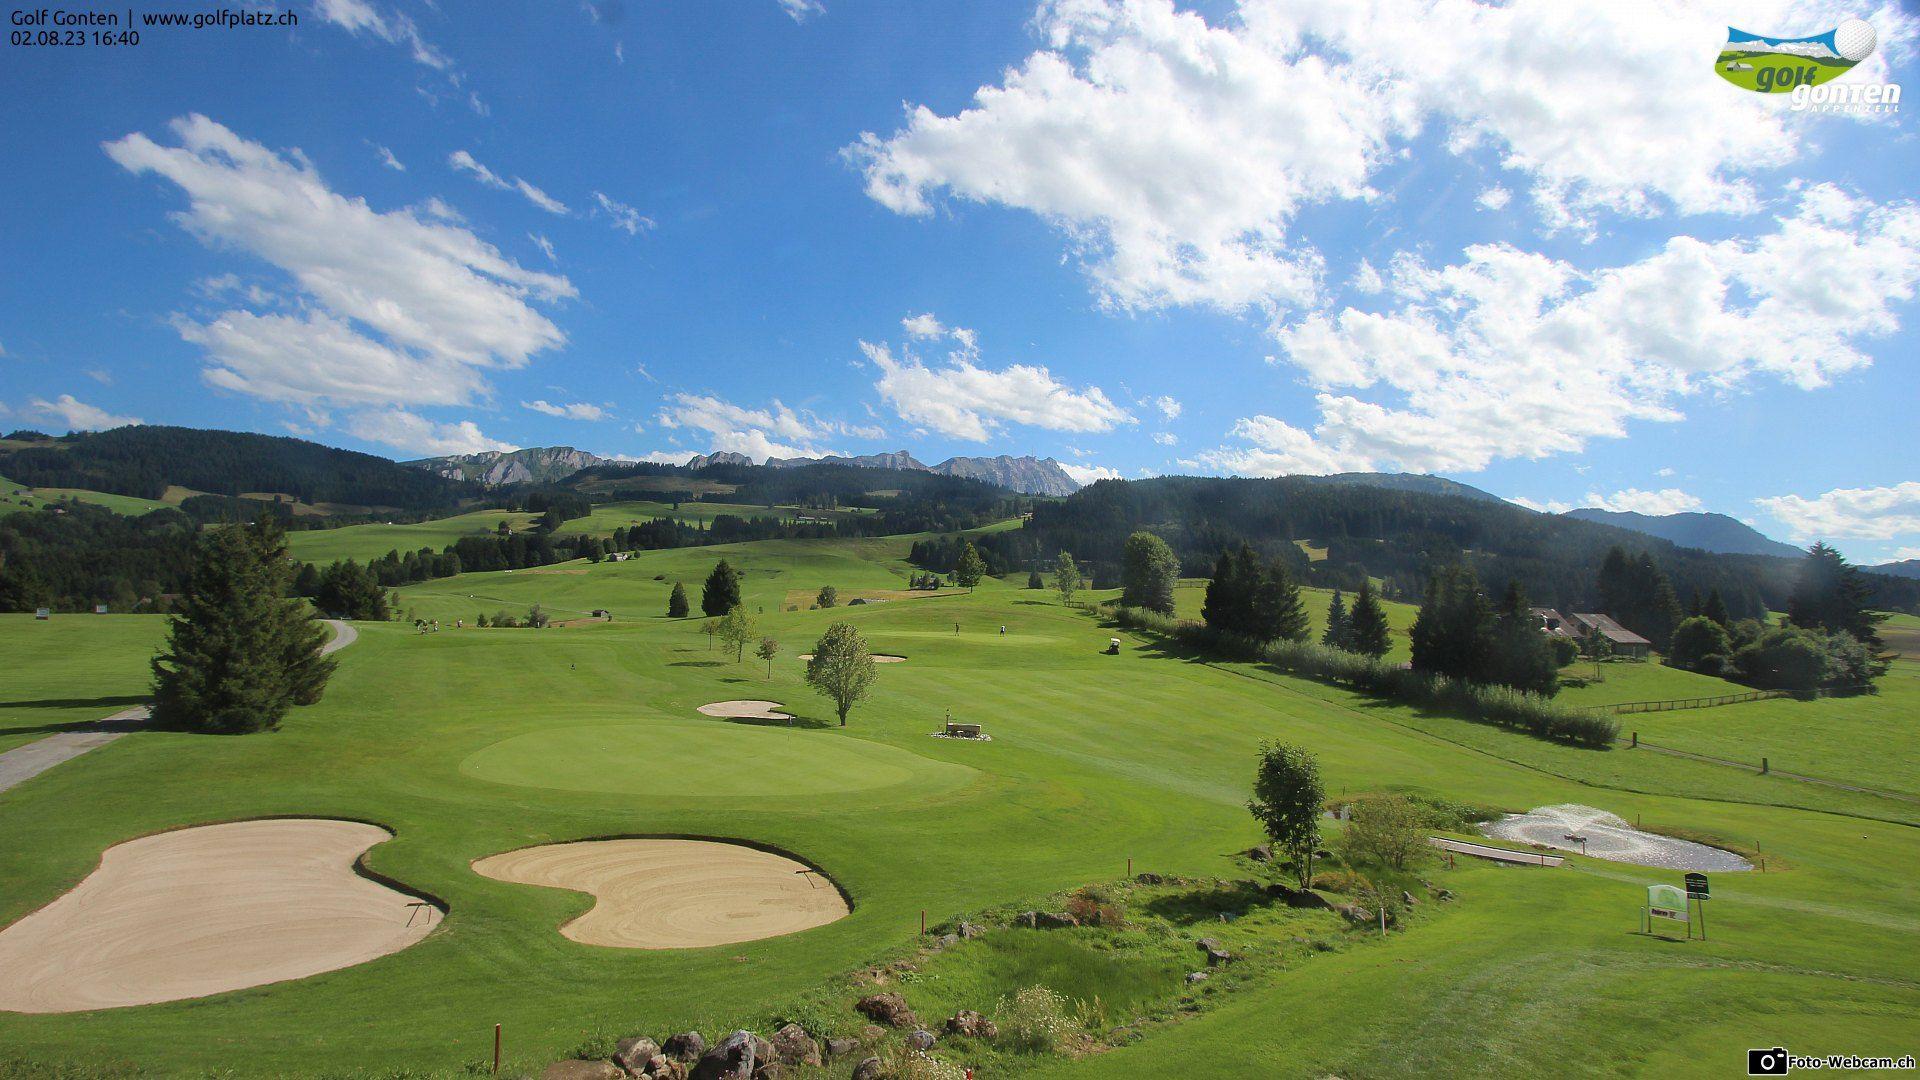 Gonten: Golfplatz